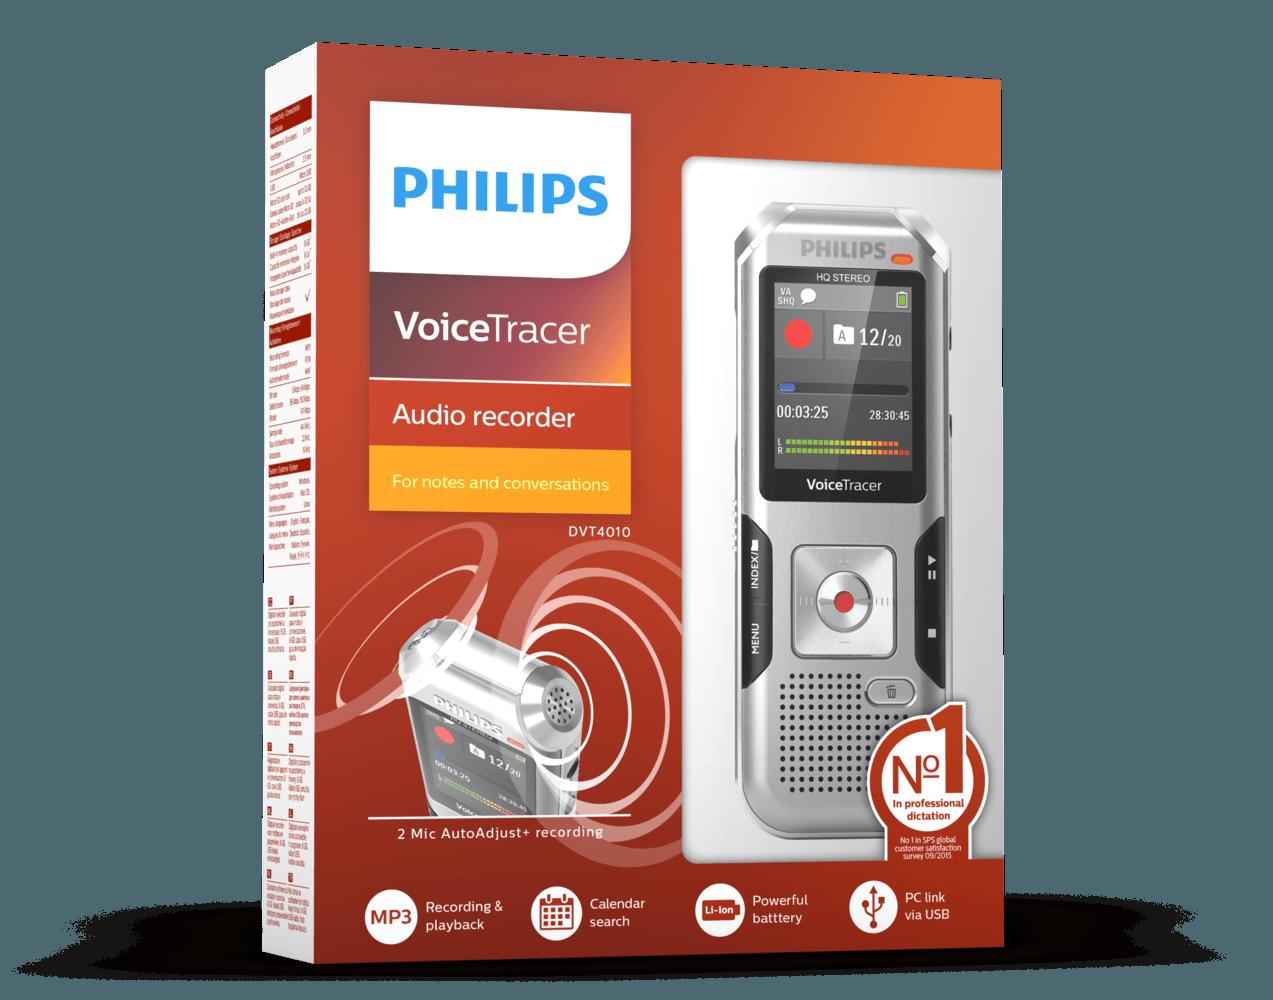 VoiceTracer audio recorder DVT4000 | Philips